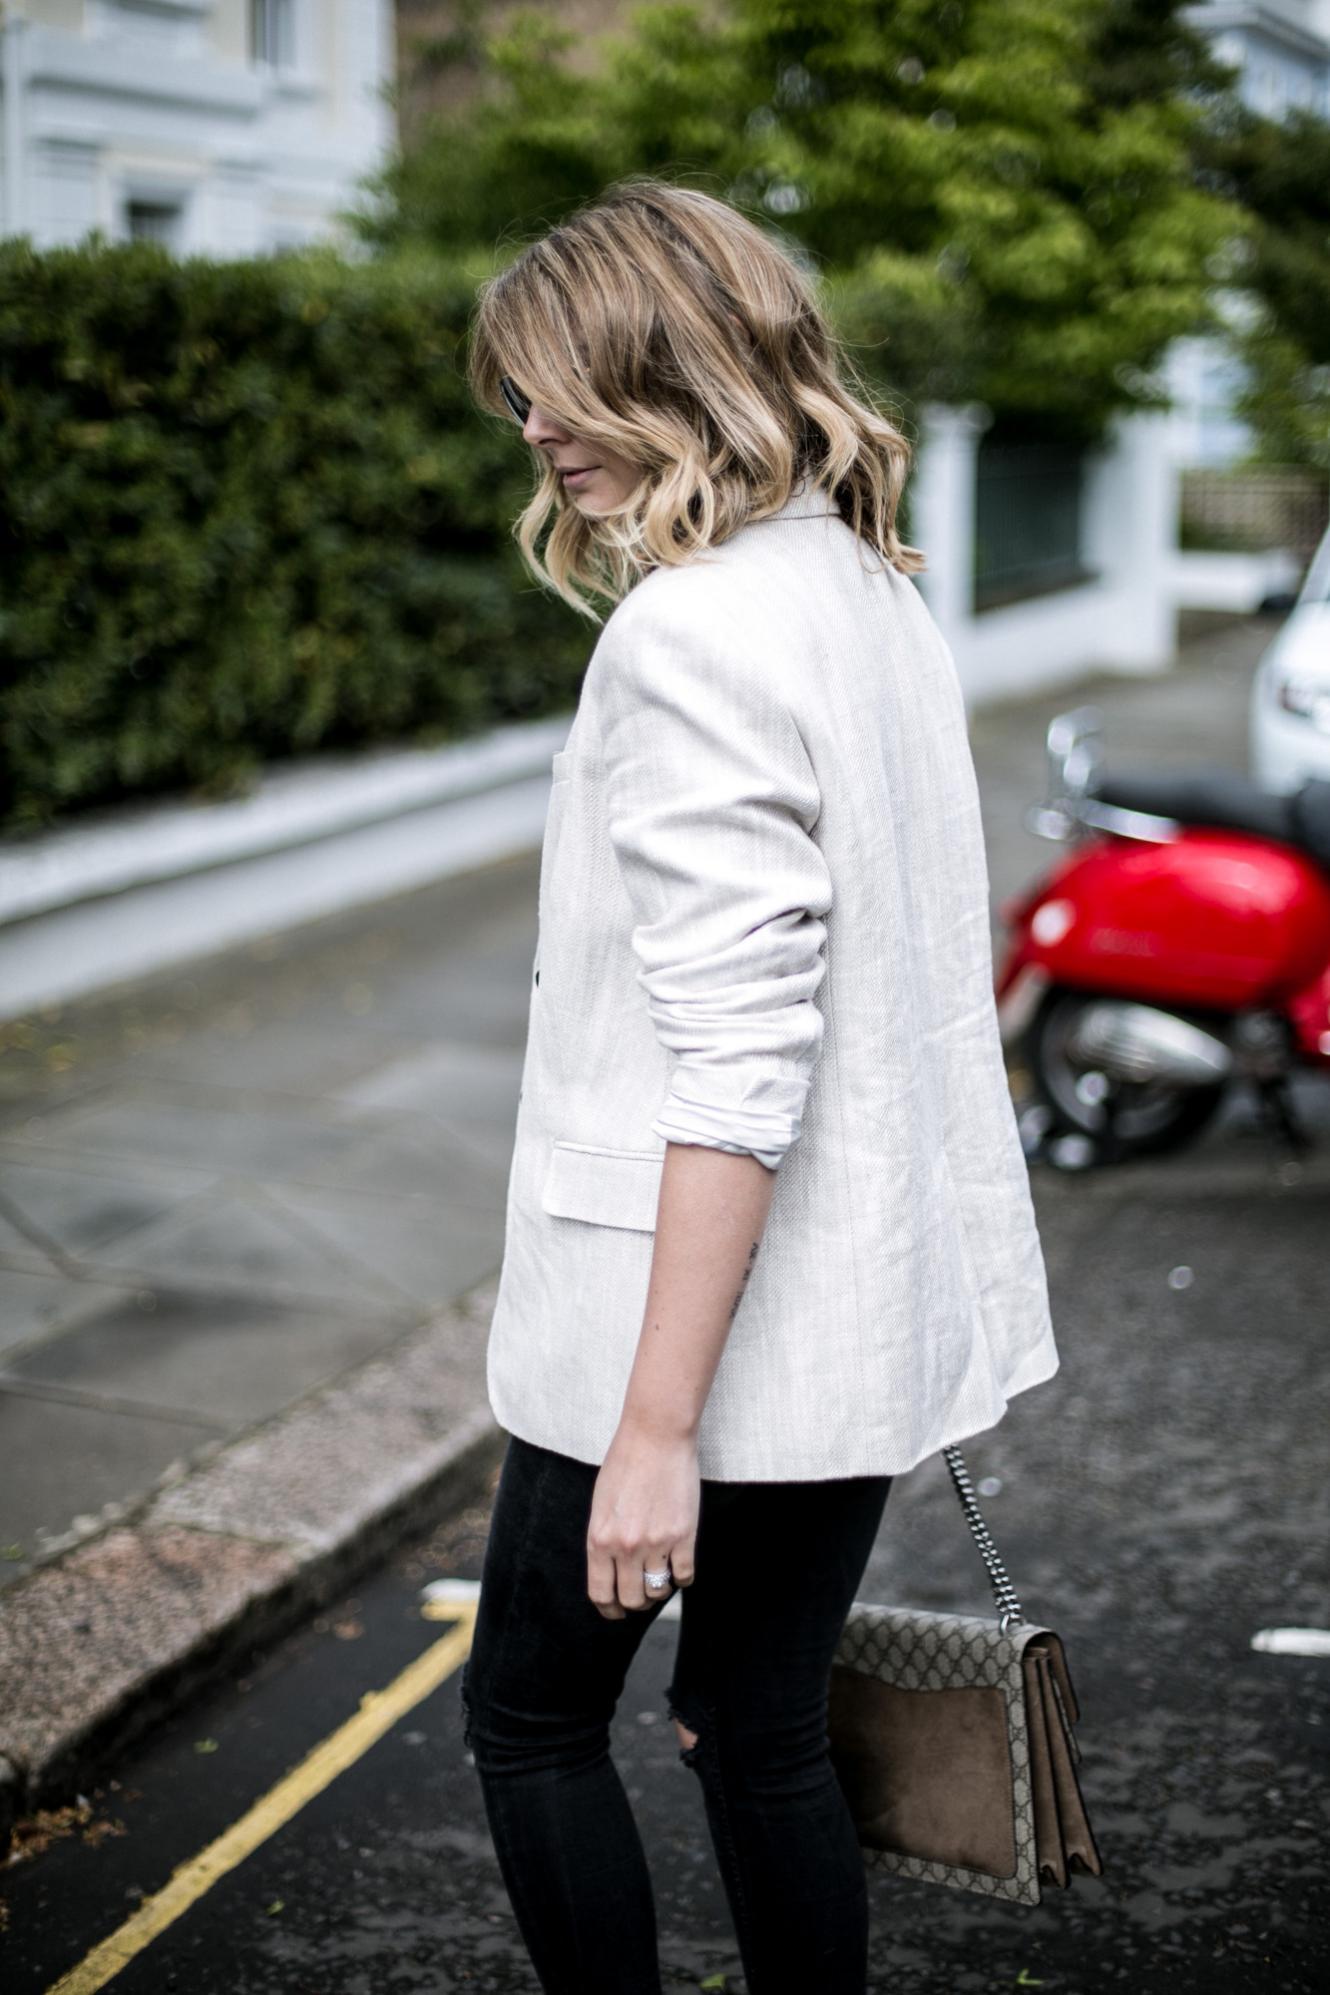 biege linen blazer, black skinny jeans, Gucci Dionysus bag